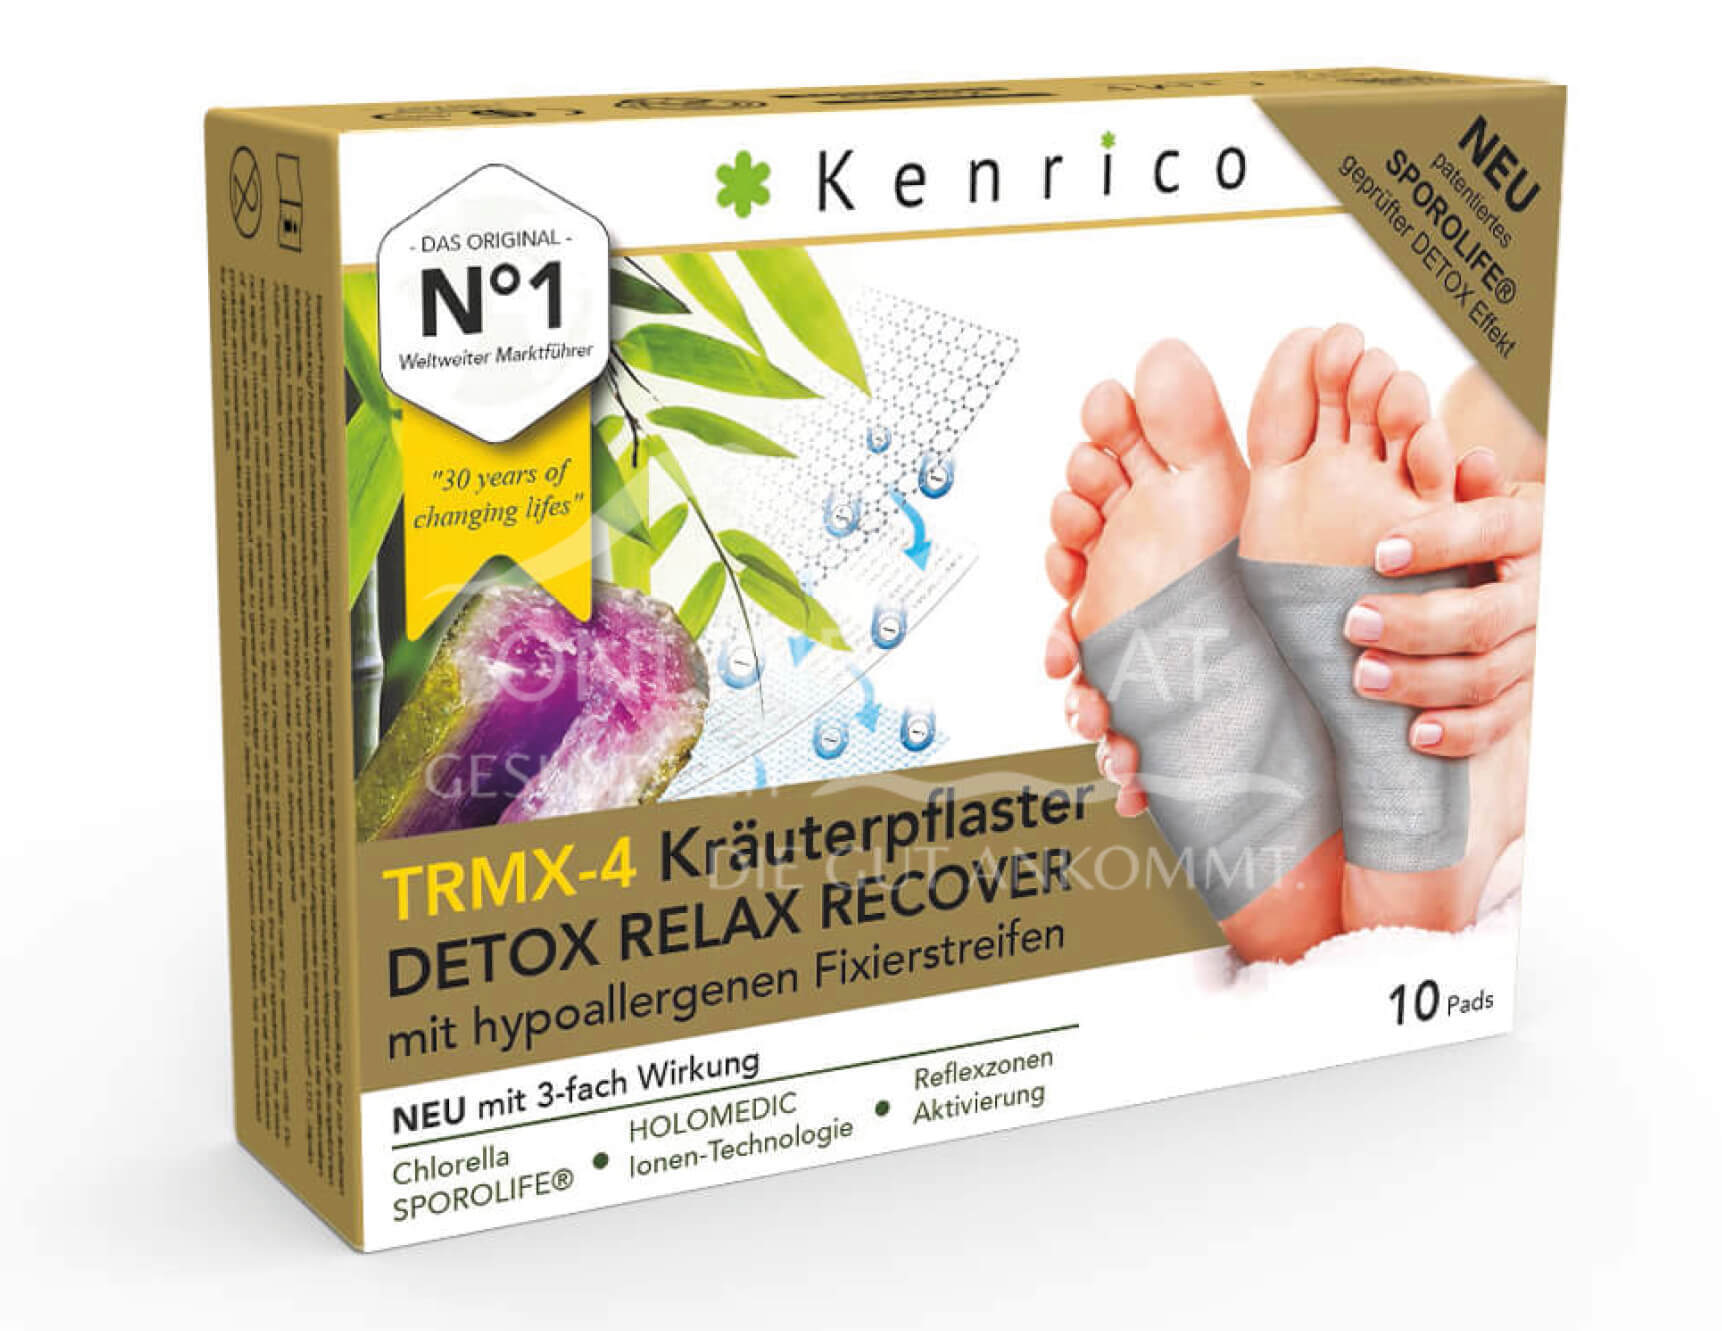 Kenrico TRMX-4 Kräuterpflaster DETOX RELAX RECOVER